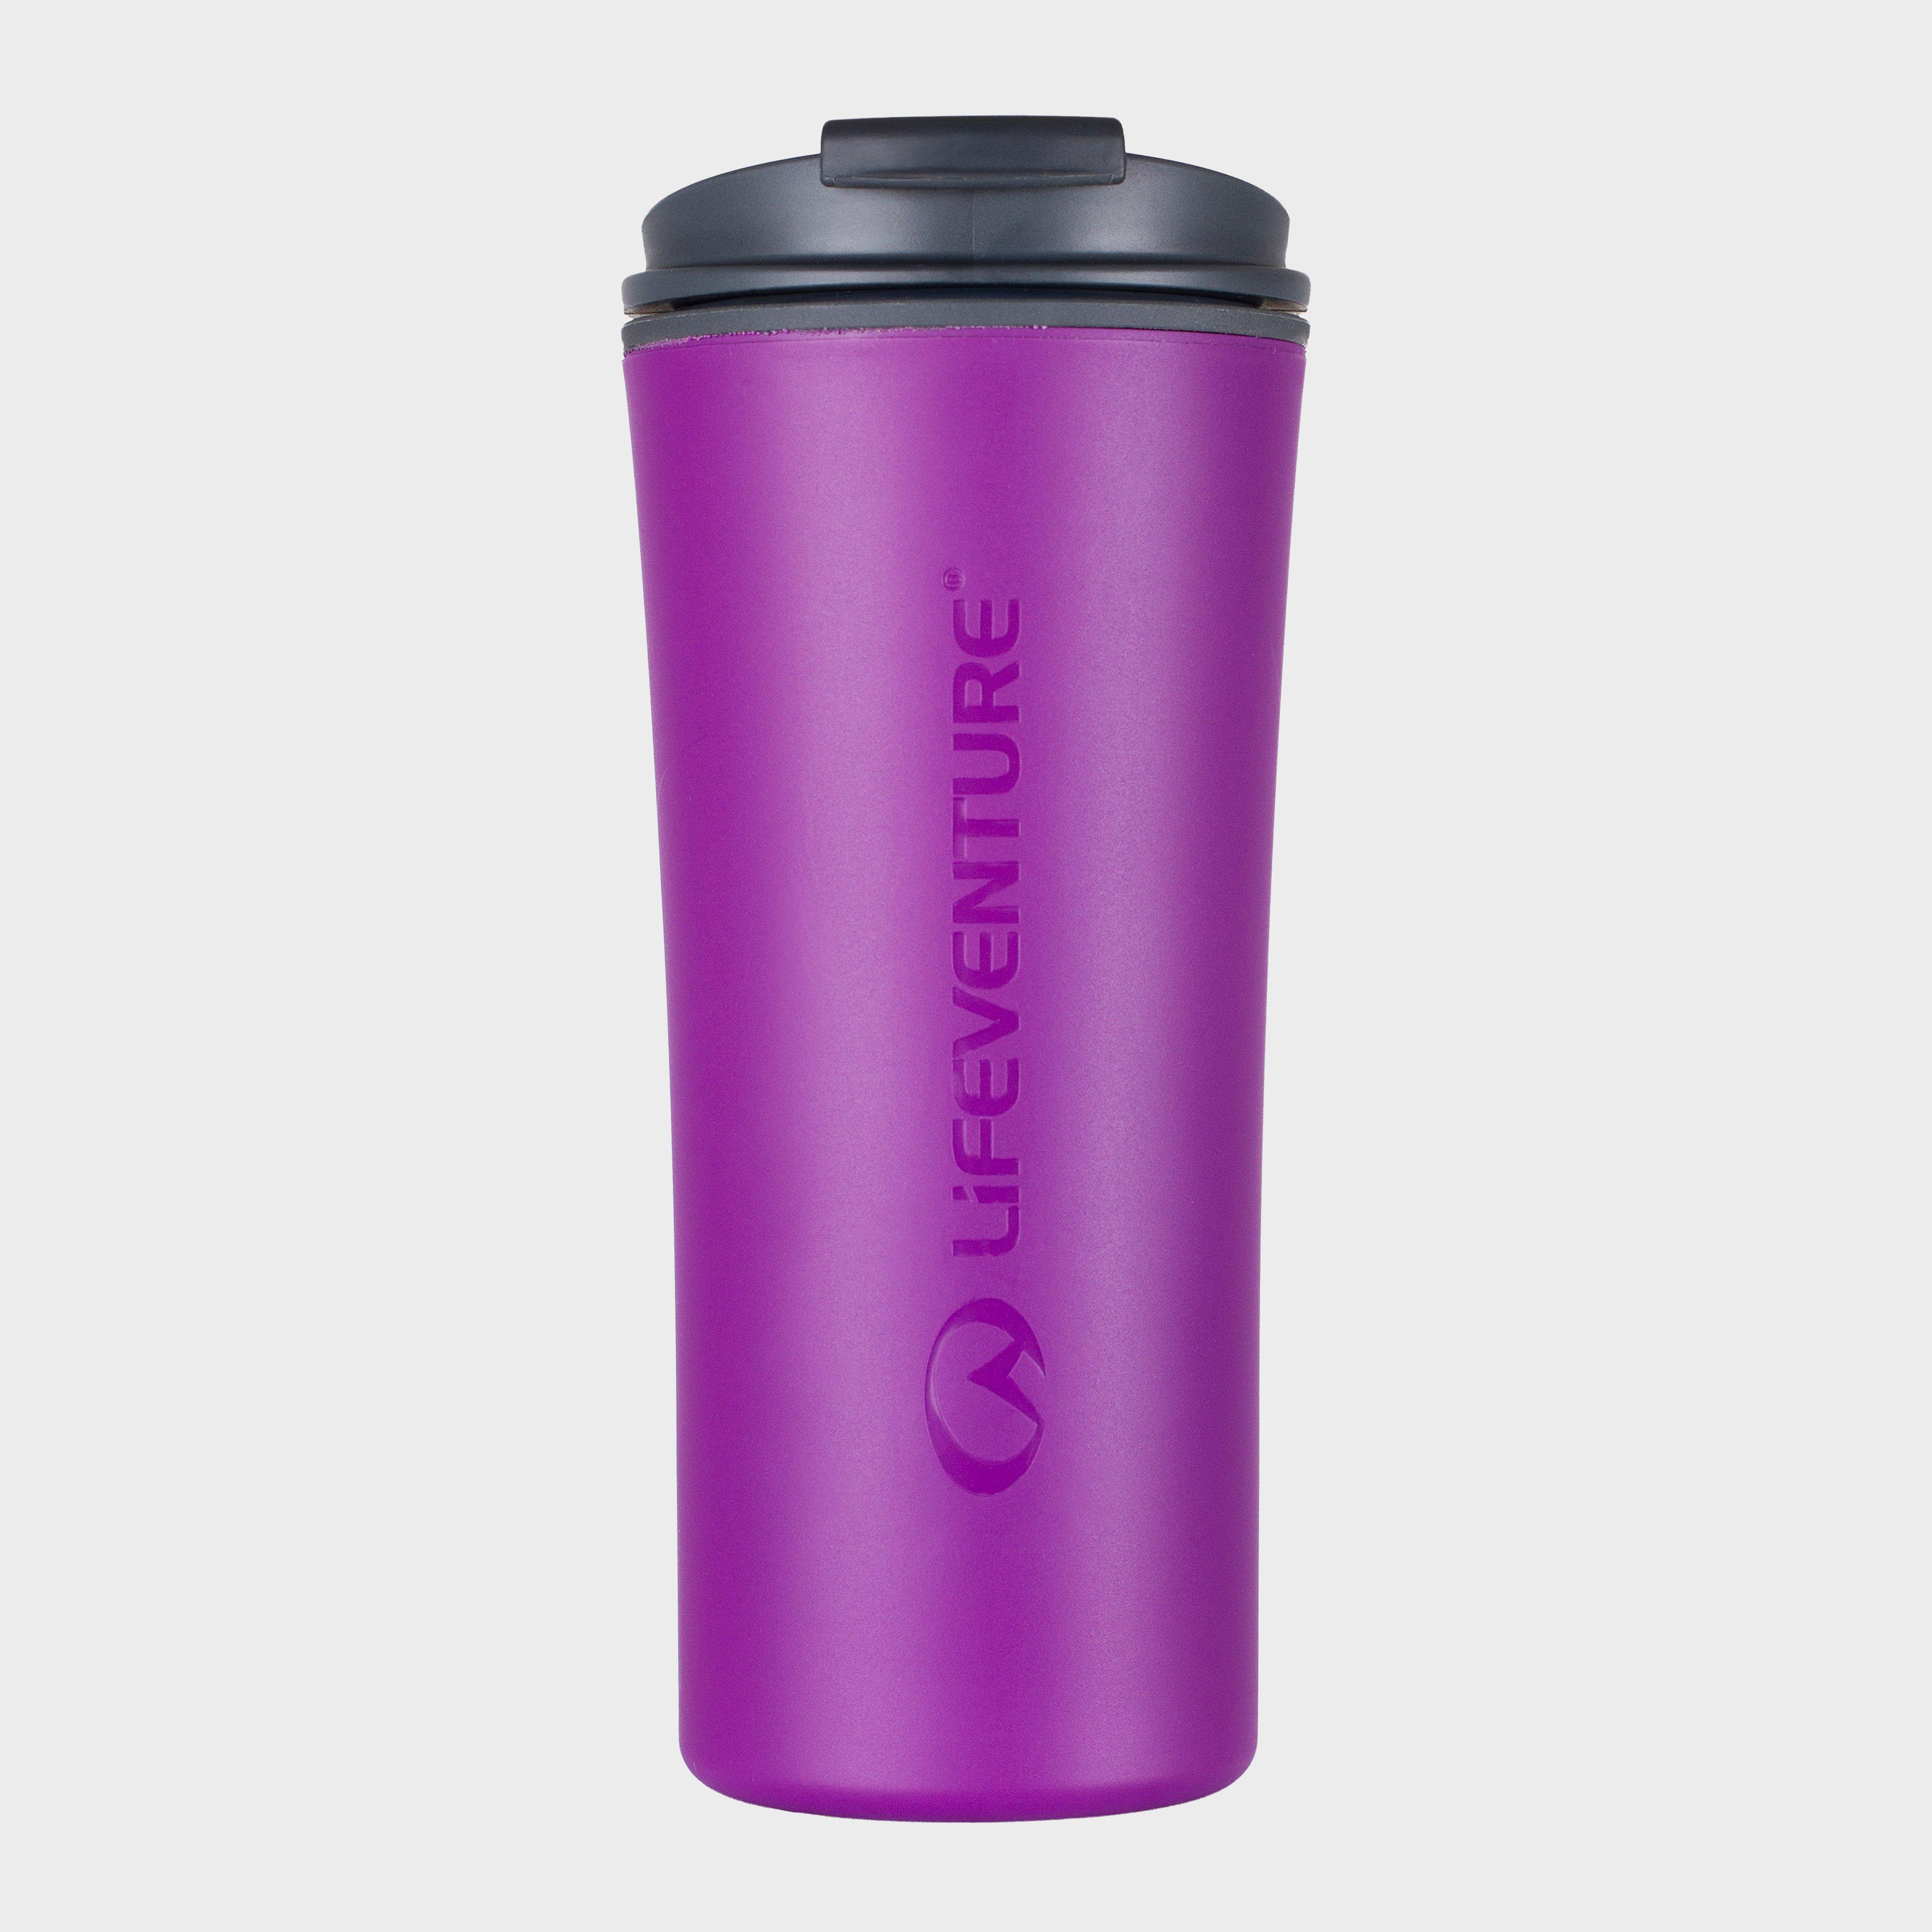 Lifeventure Lifeventure Elipse Travel Mug - Purple, Purple